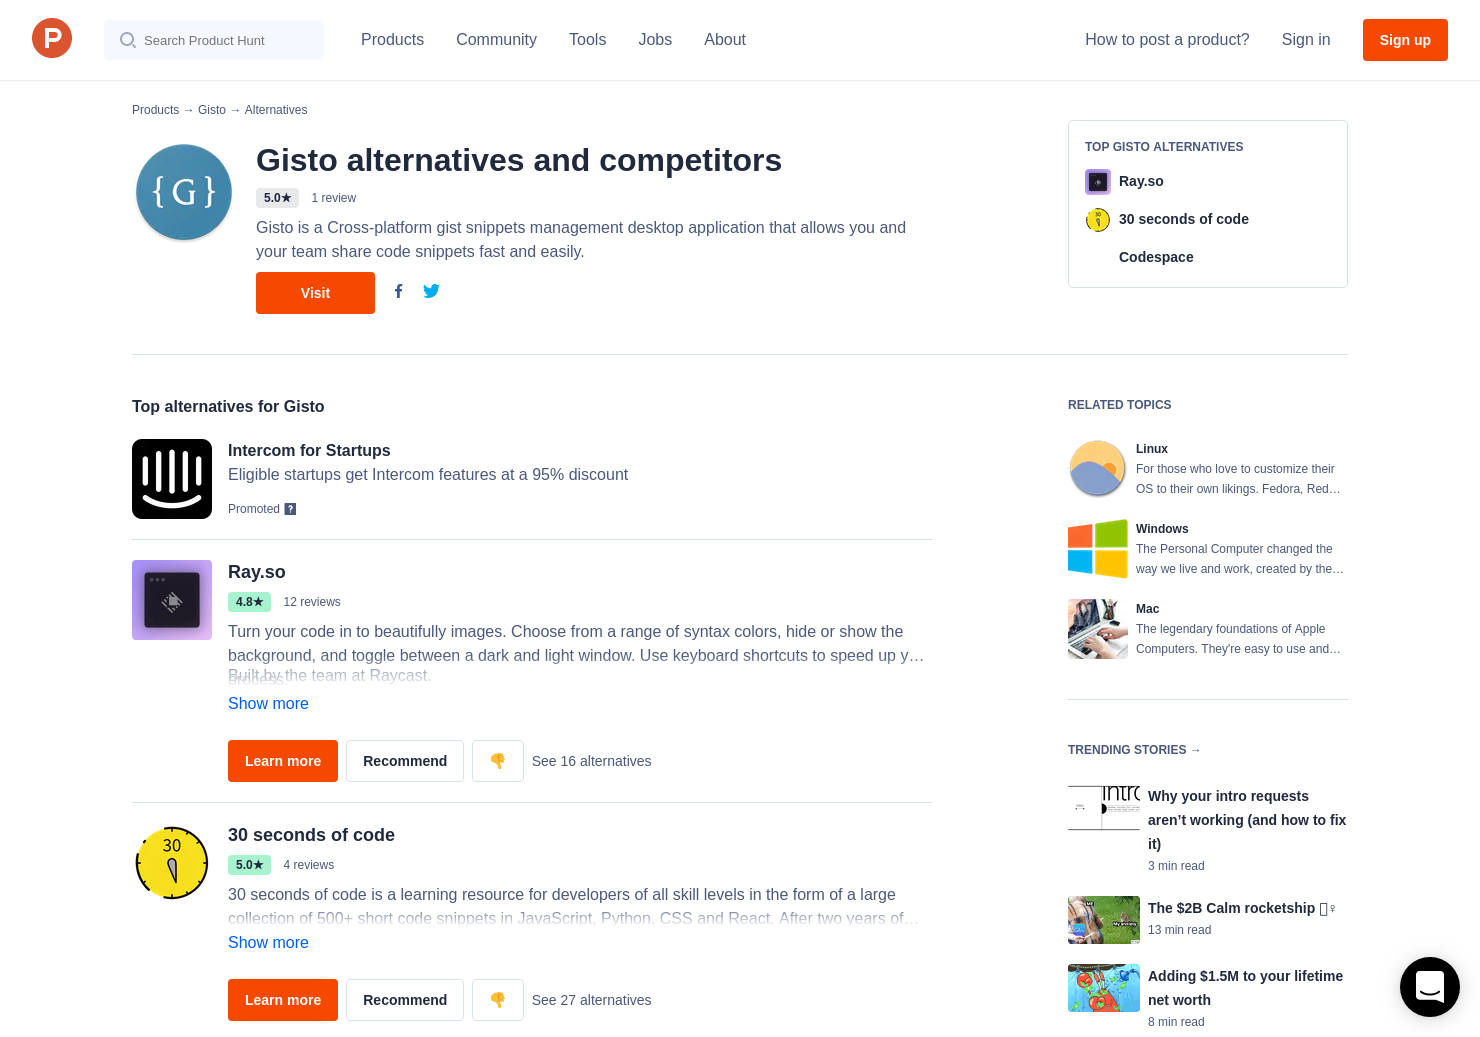 14 Alternatives to Gisto 2 0 for Linux, Windows, Mac